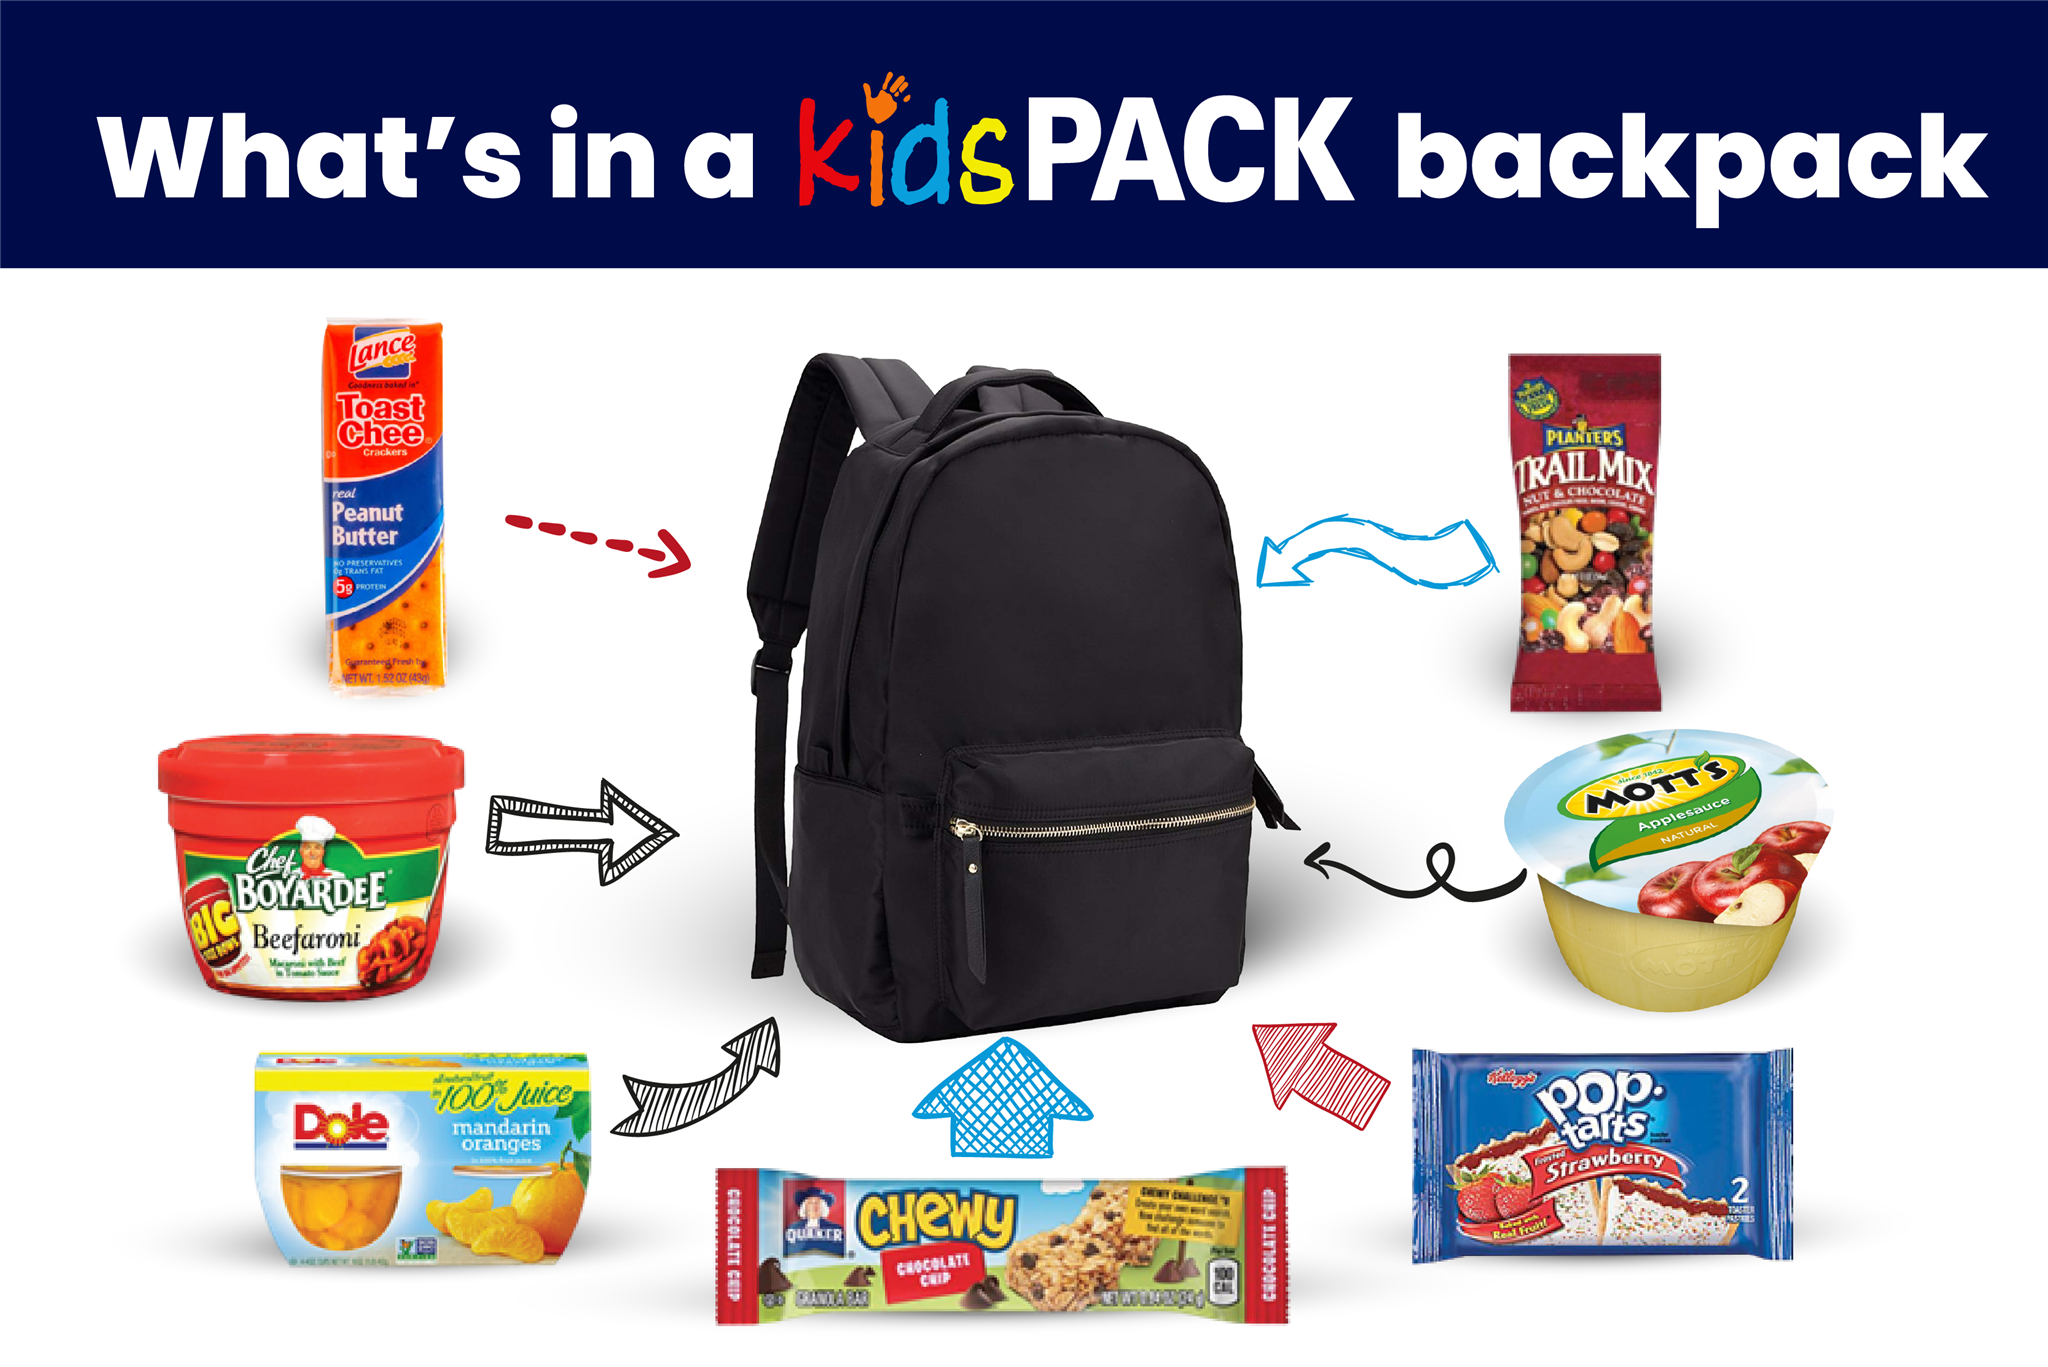 How we choose what's in a kidsPACK